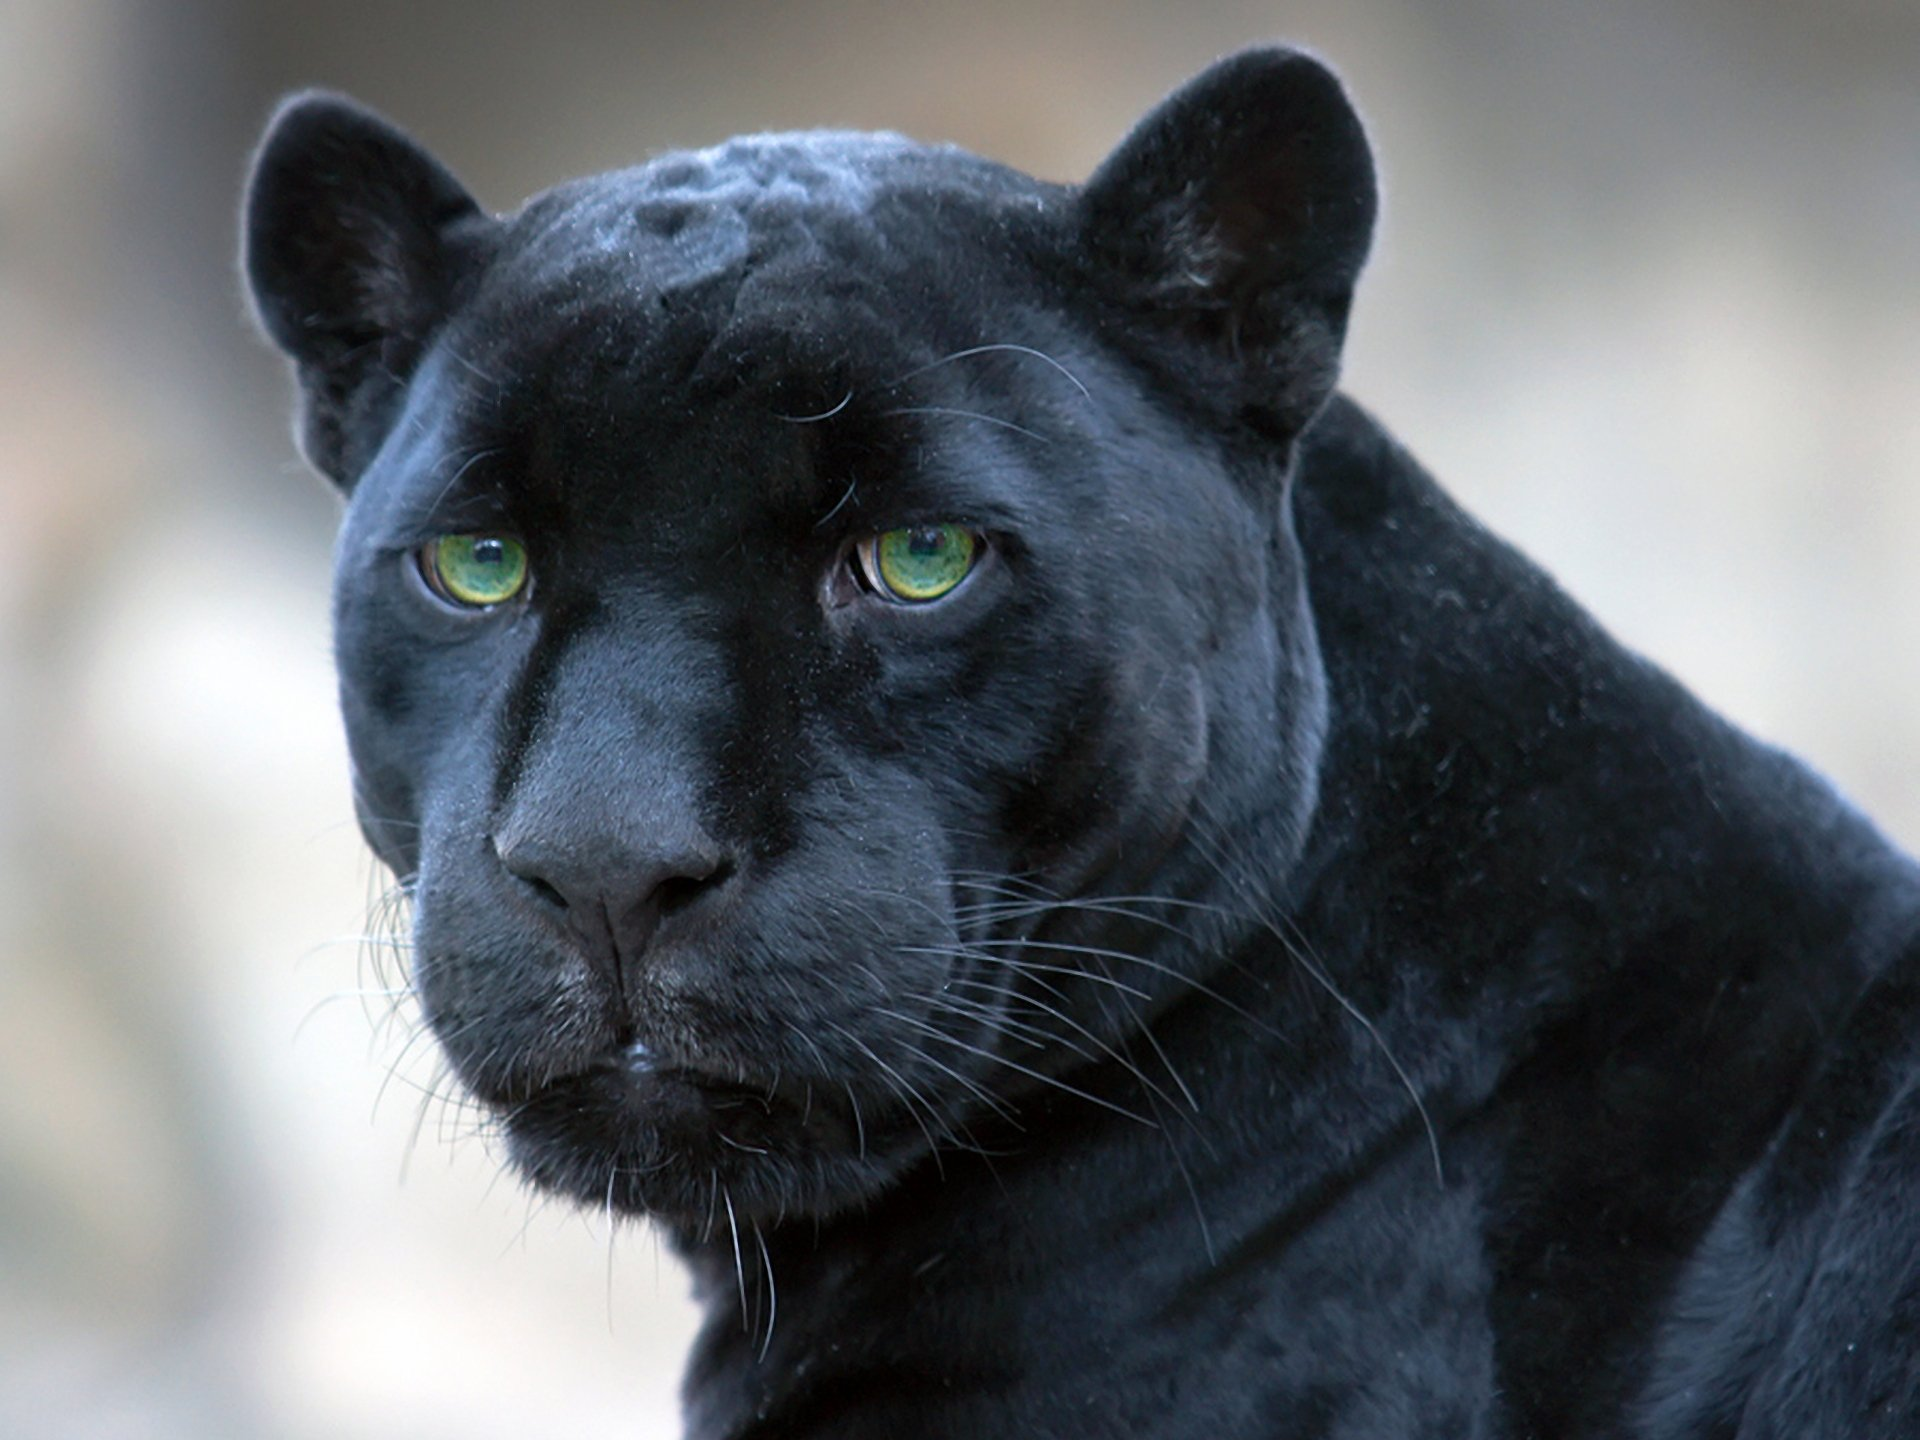 Baby Black Jaguar Wallpaper Black Jaguar Wallpapers Images Animals Wallpaper Timmatic Jaguar Cat Black Blue Bispy Agressive Wallpaper 1920x1440